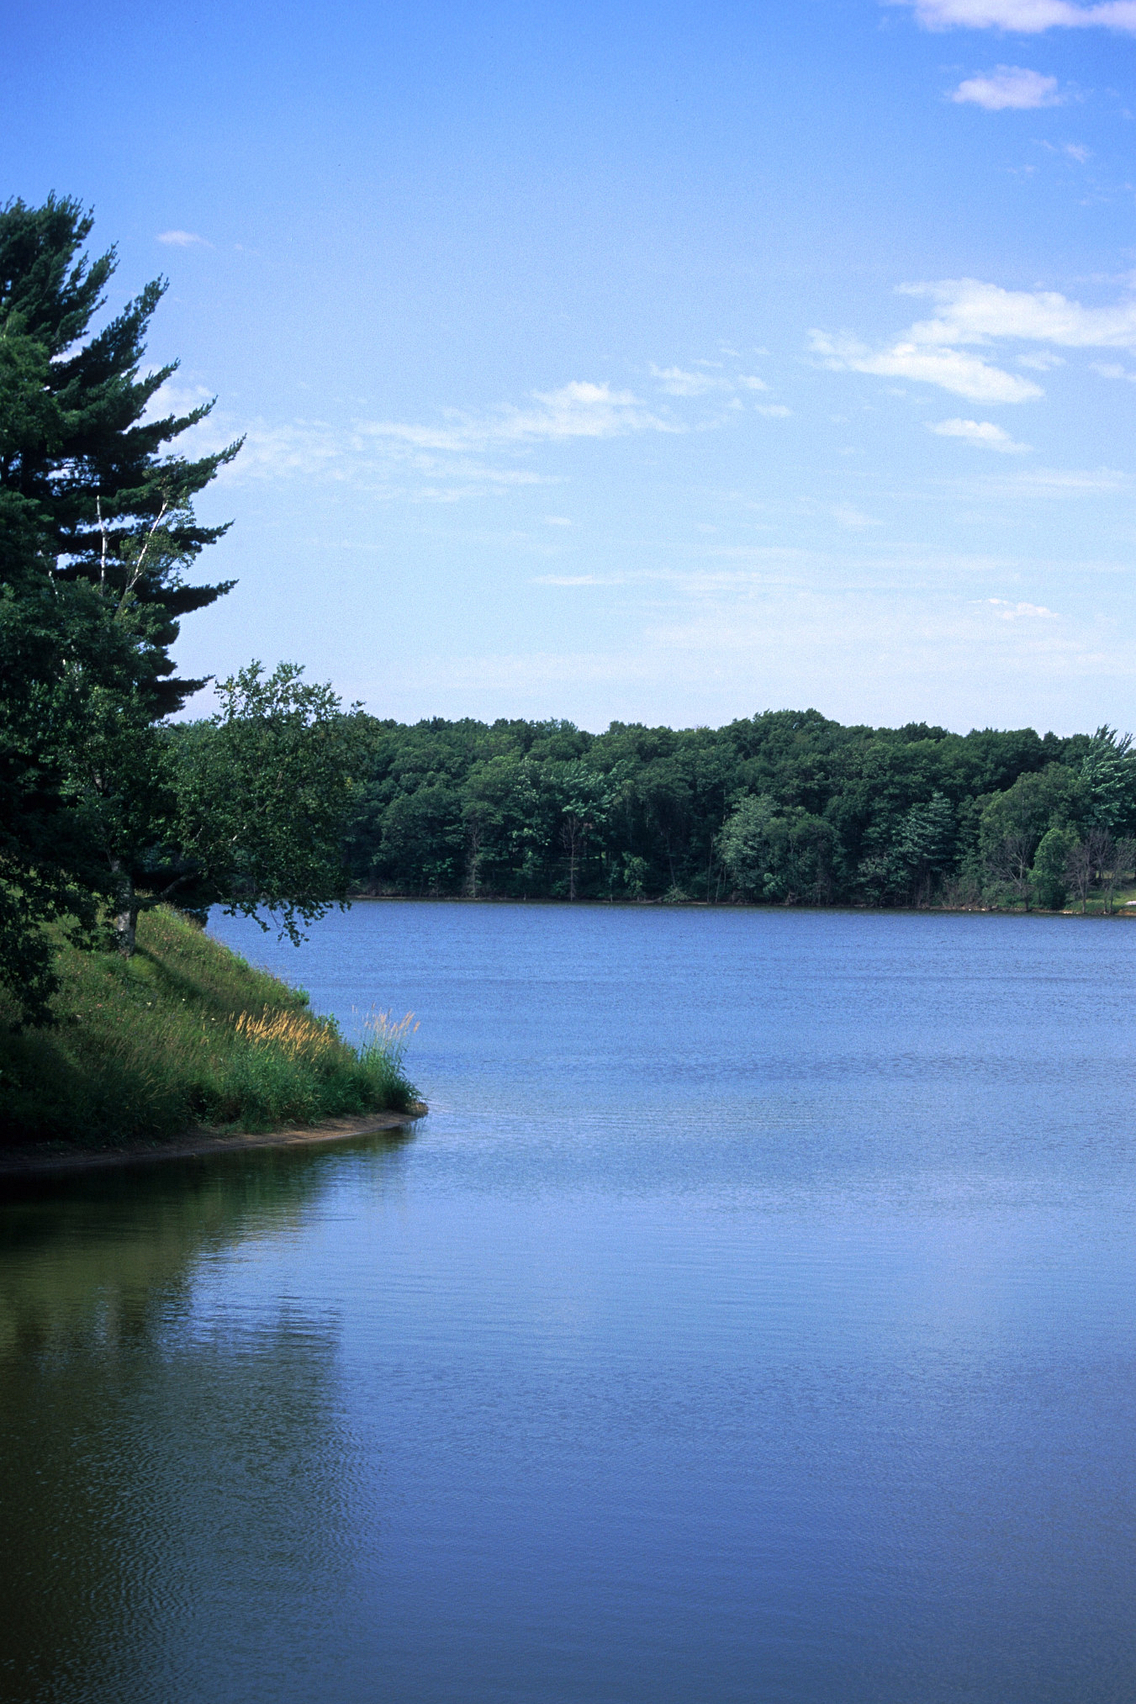 Pine tree overlooking edge of beautiful blue lake